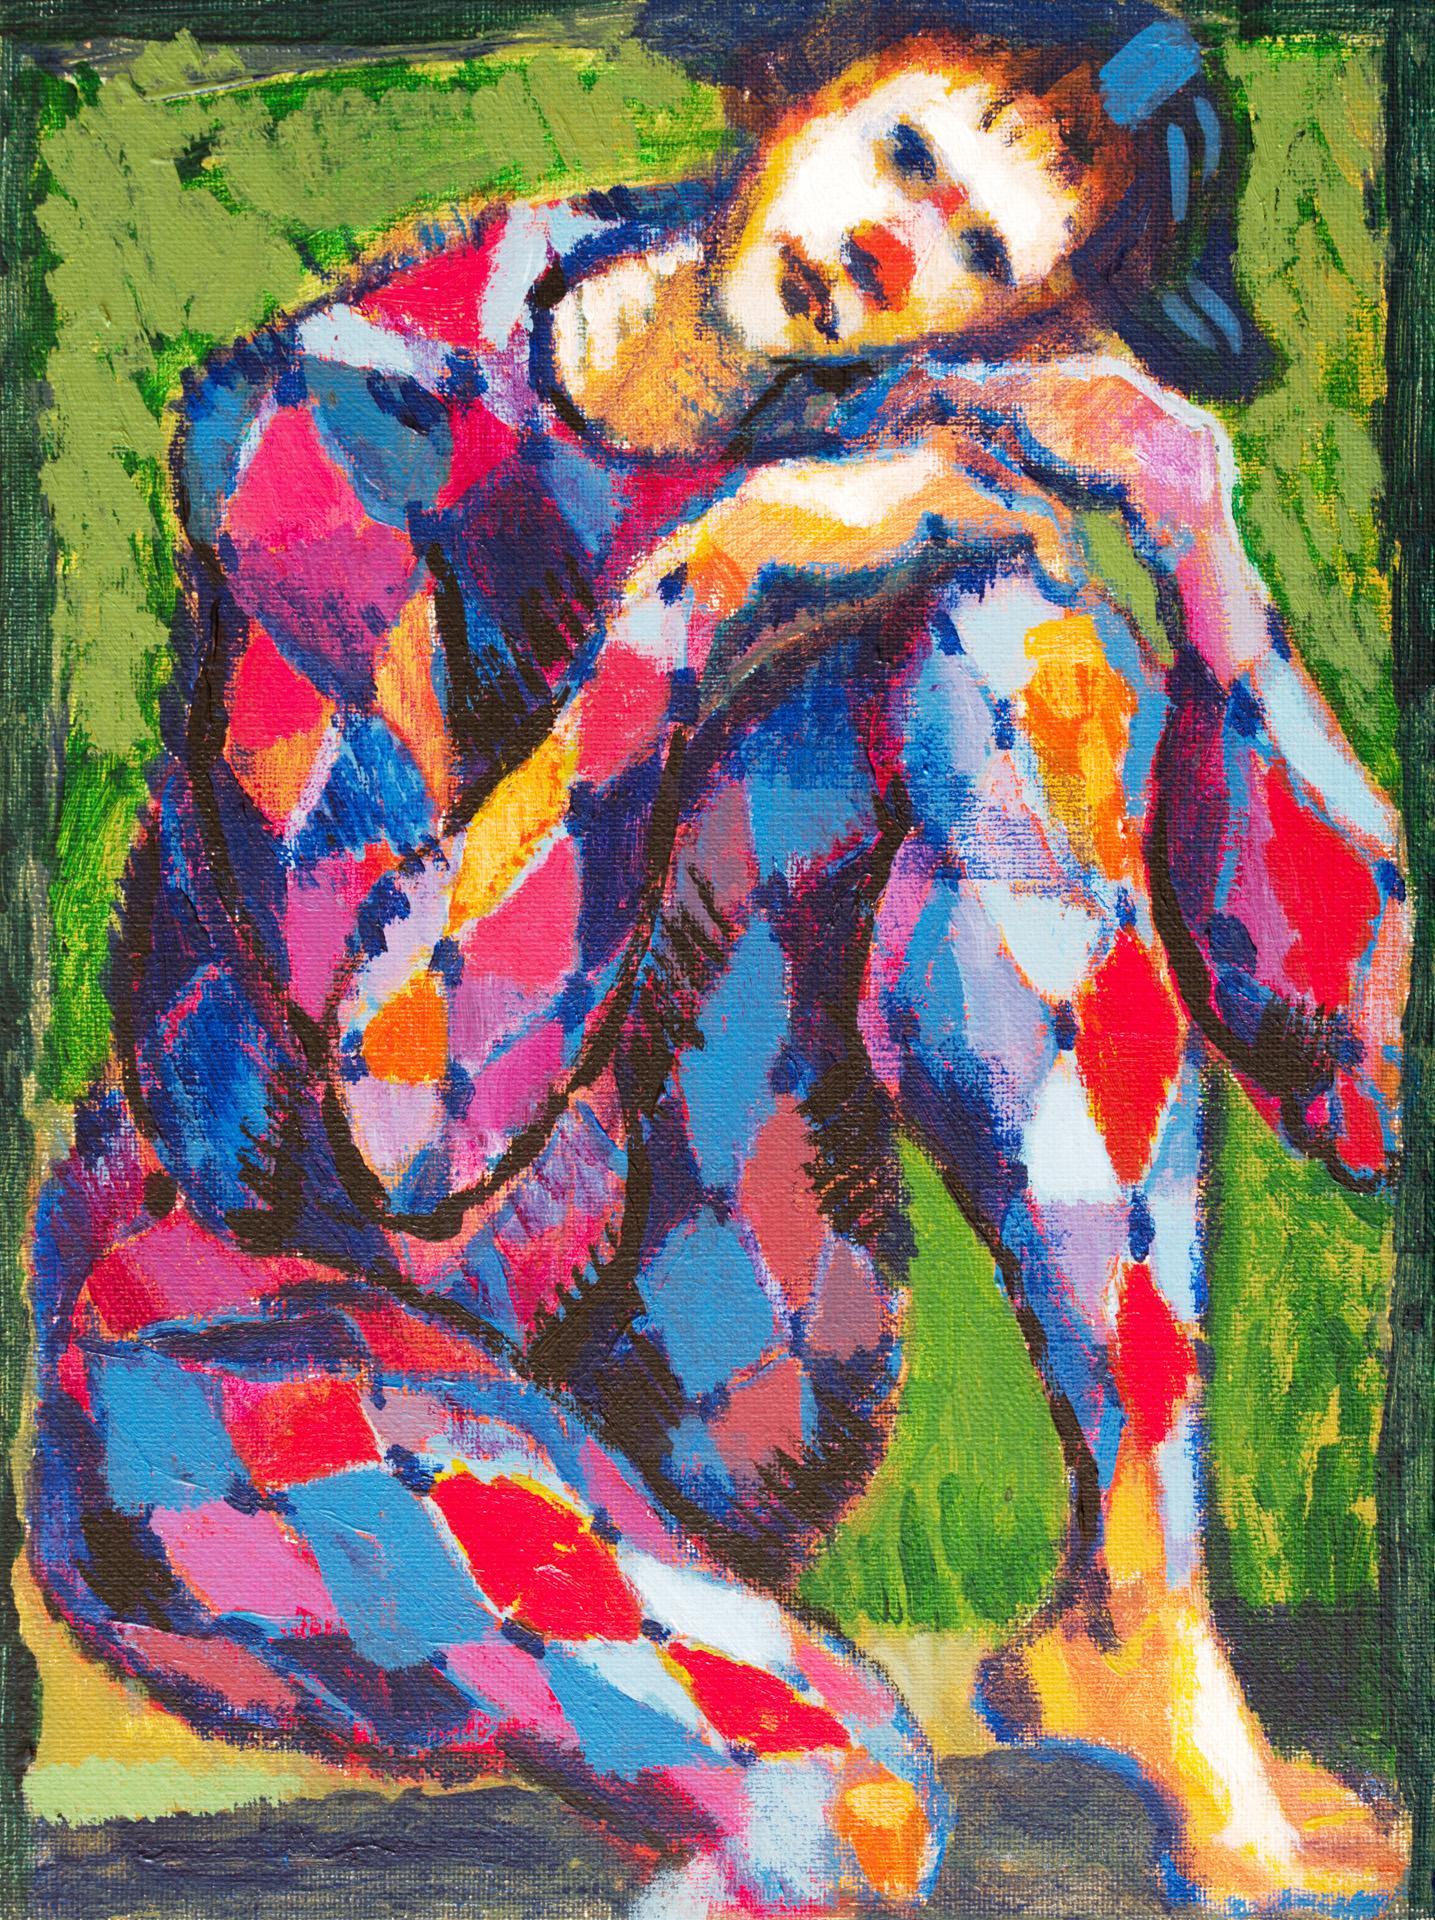 Harlequin II  / 1996 / oil on canvas / 30x40 cm